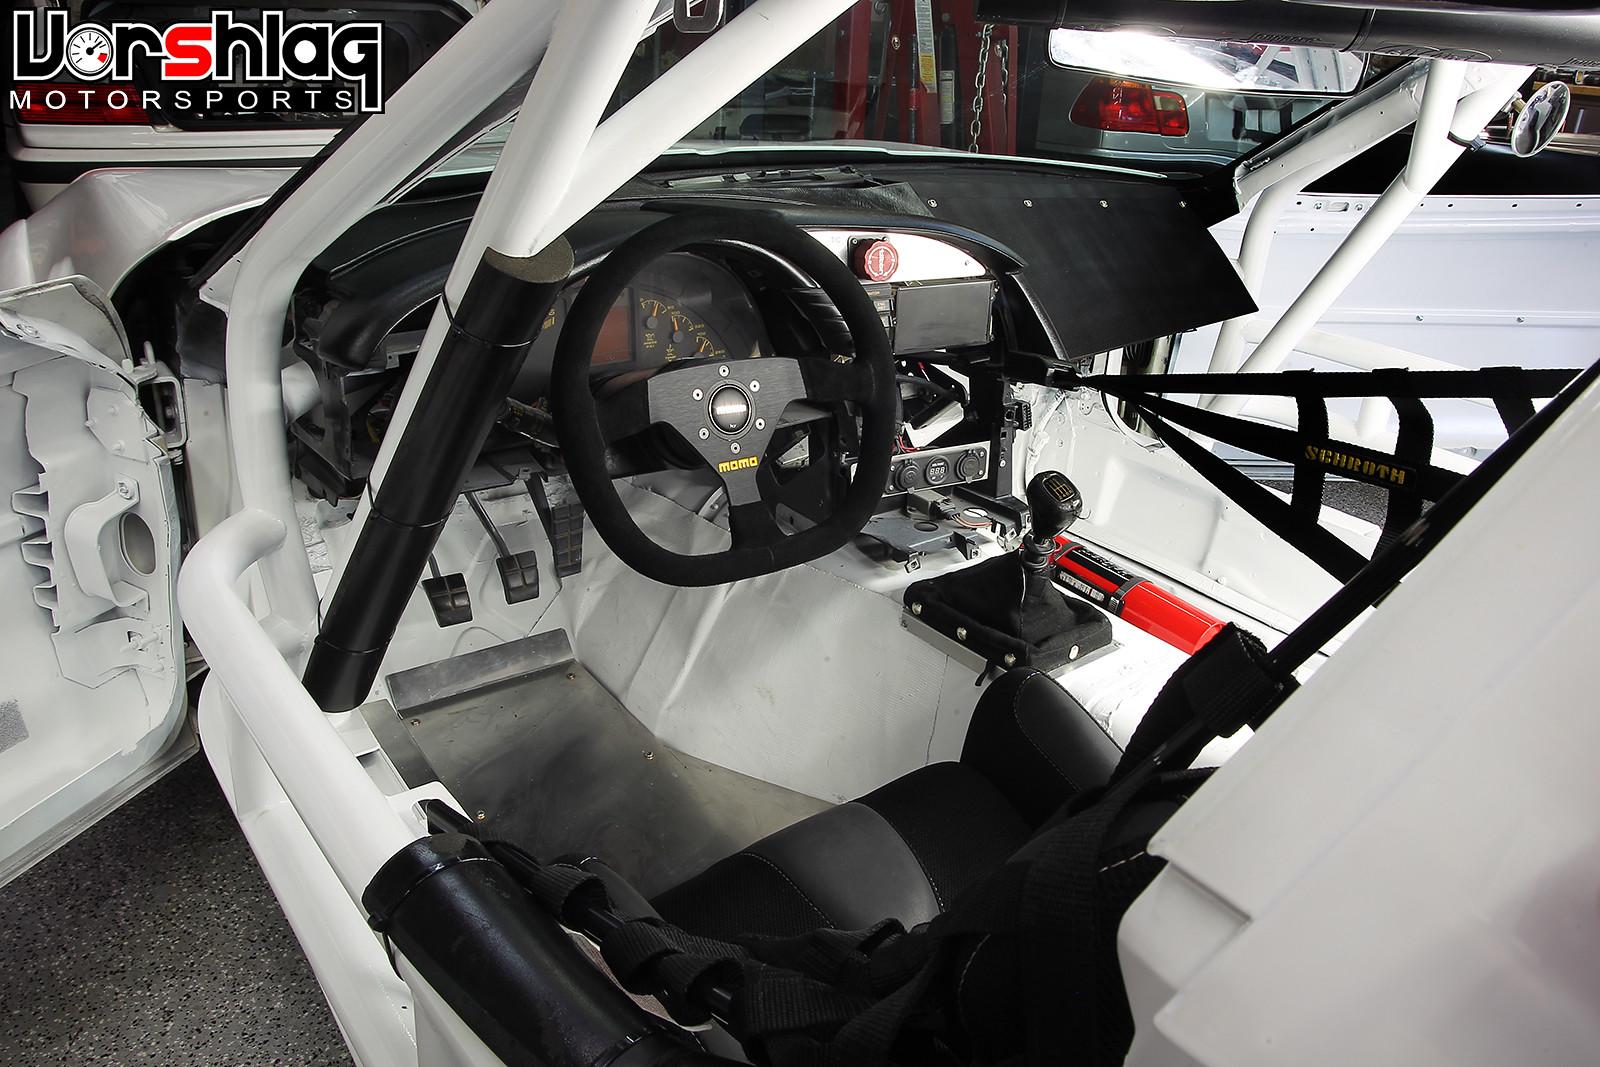 1992 Chevrolet Corvette interior drivers seat